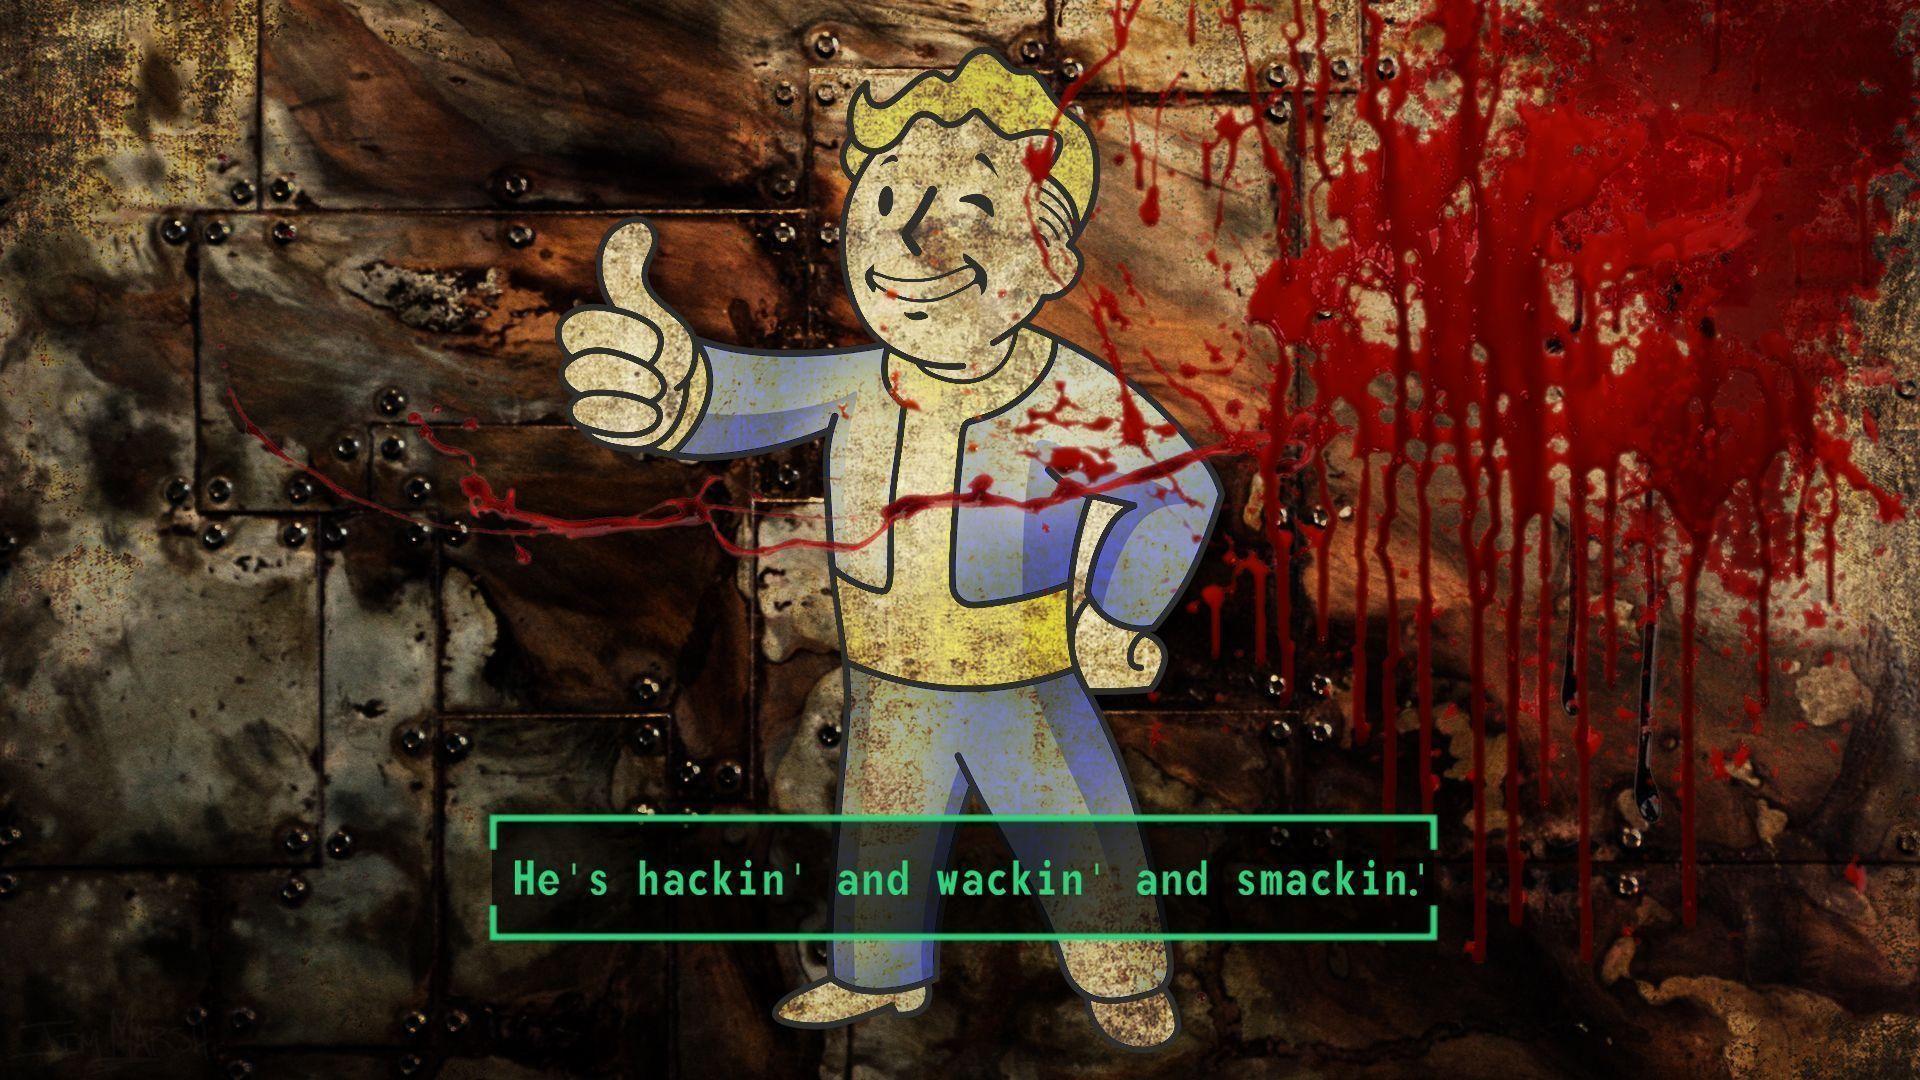 Fallout 4 Hd Wallpaper Fallout Wallpaper Hd Wallpaper Wallpaper